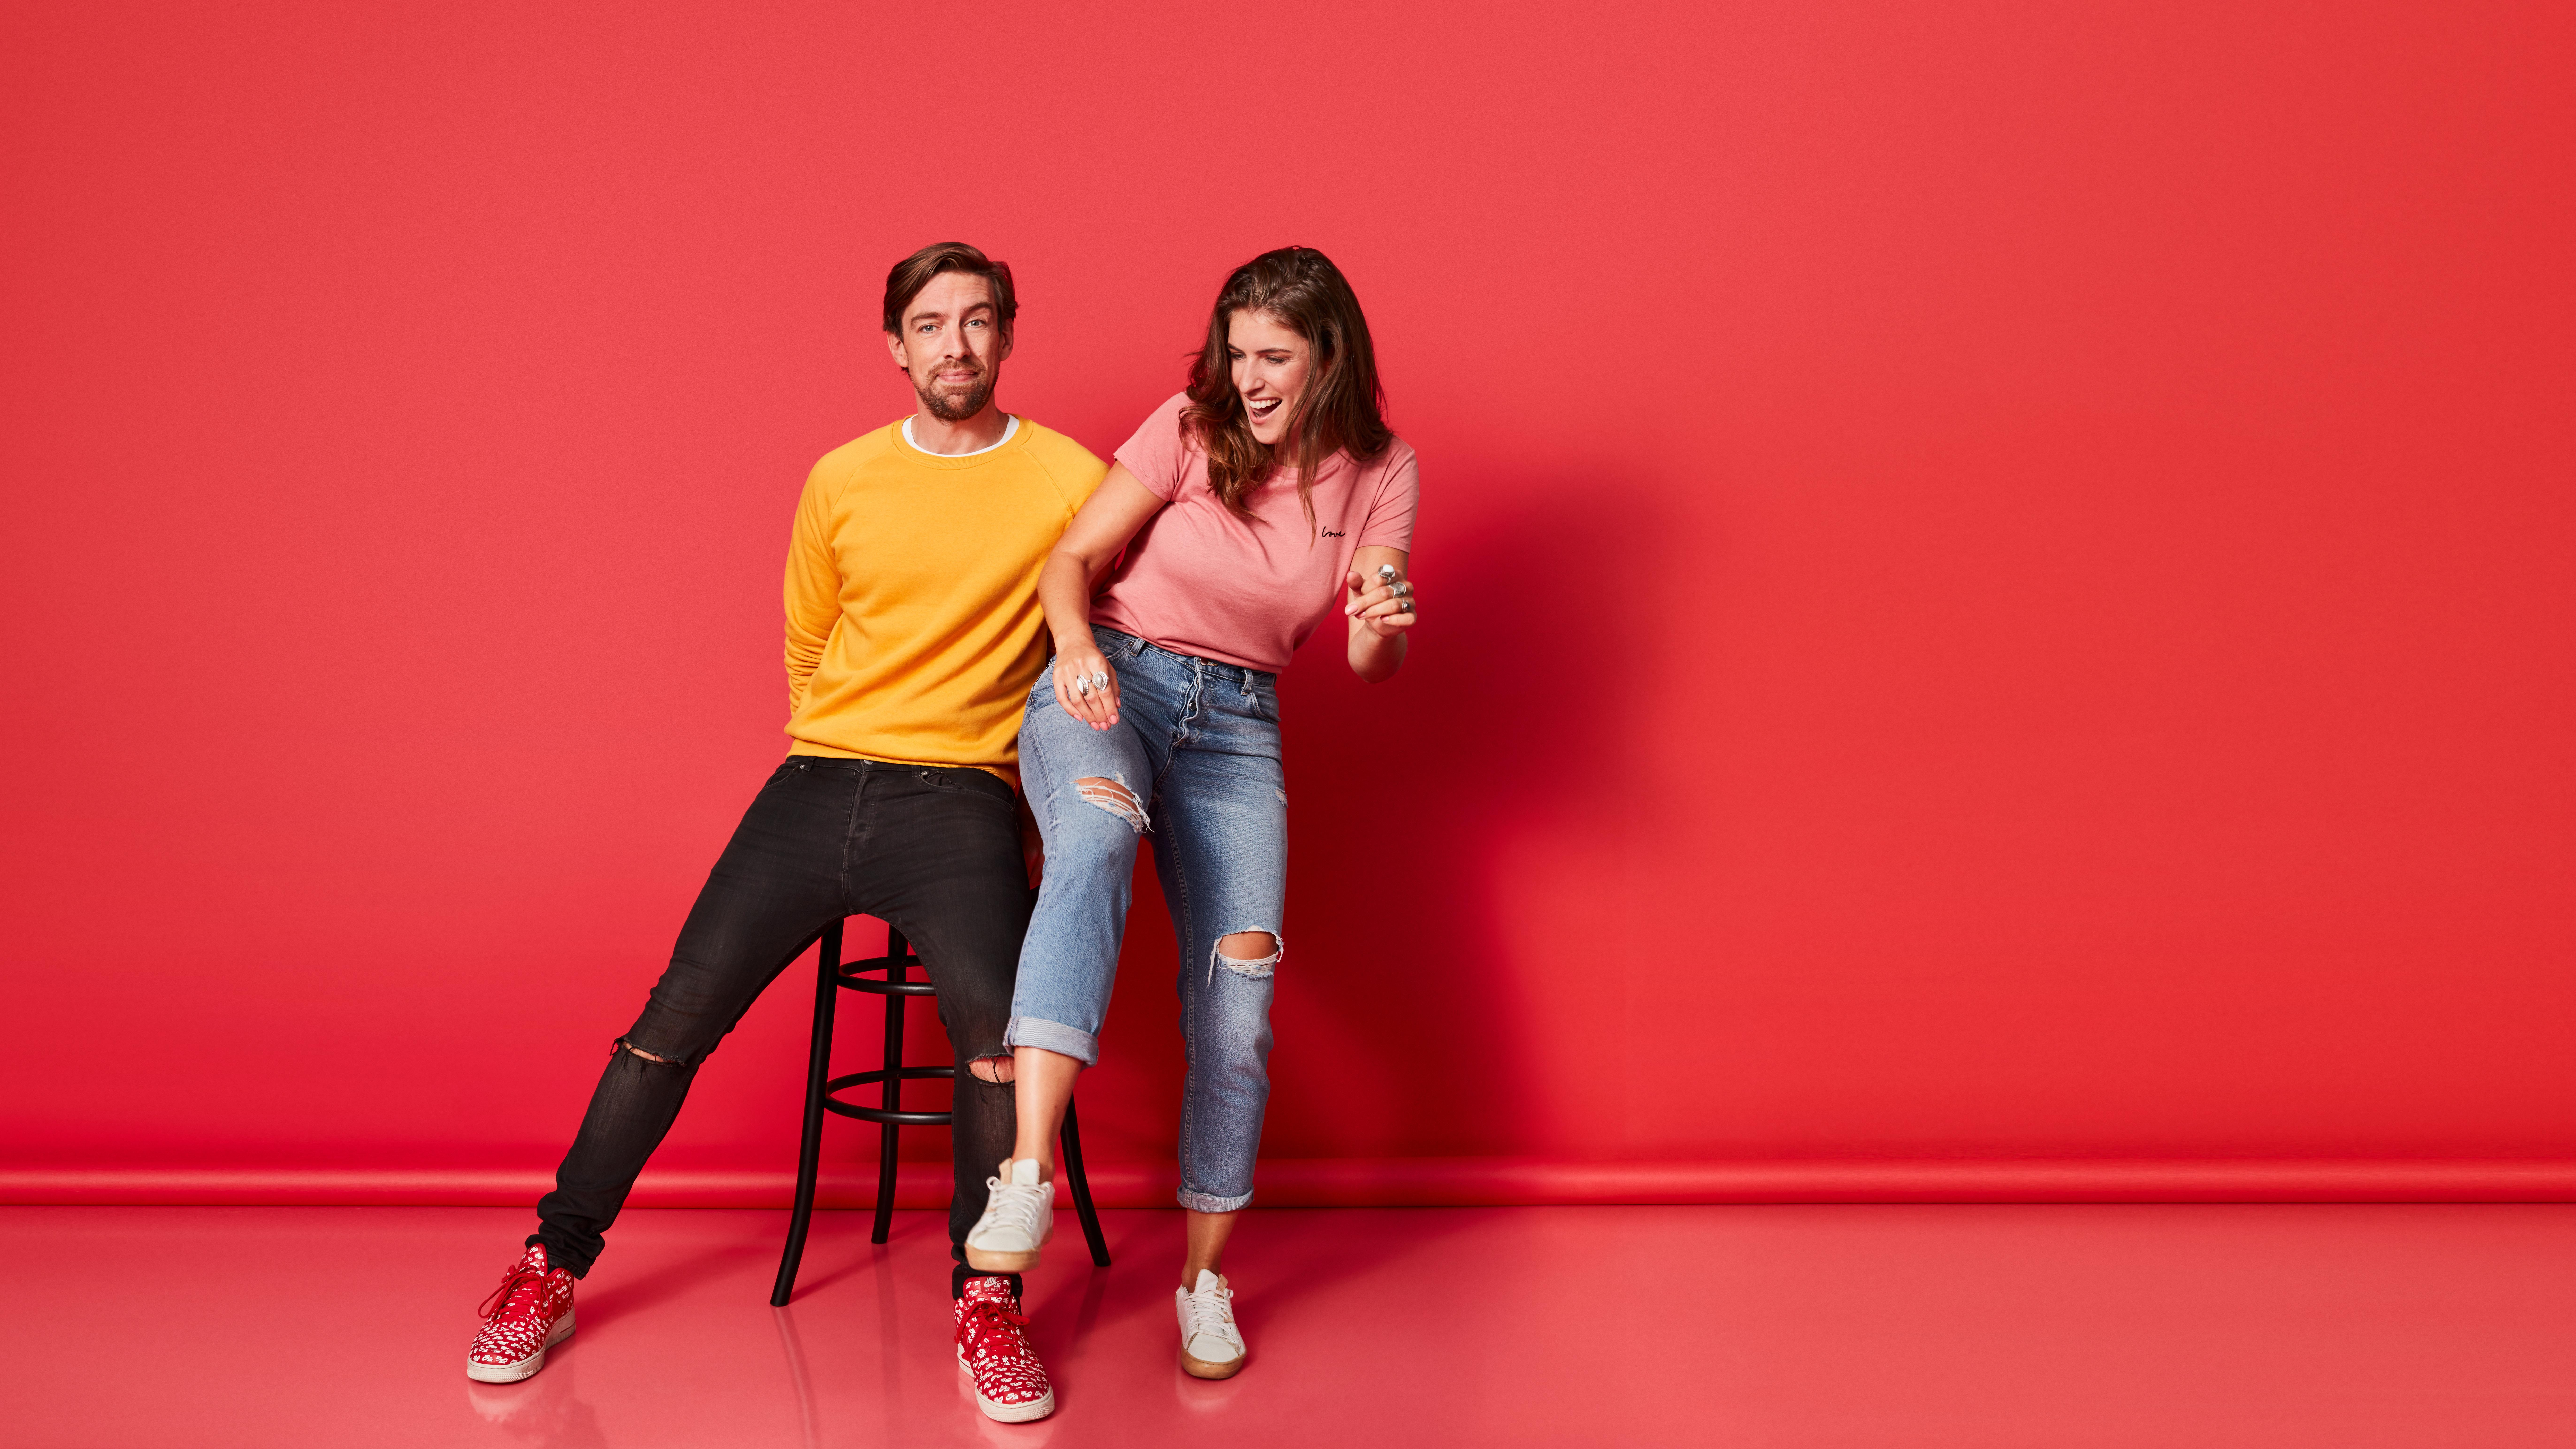 Mattie en Marieke (Qmusic) - Persfoto Qmusic (persbericht)